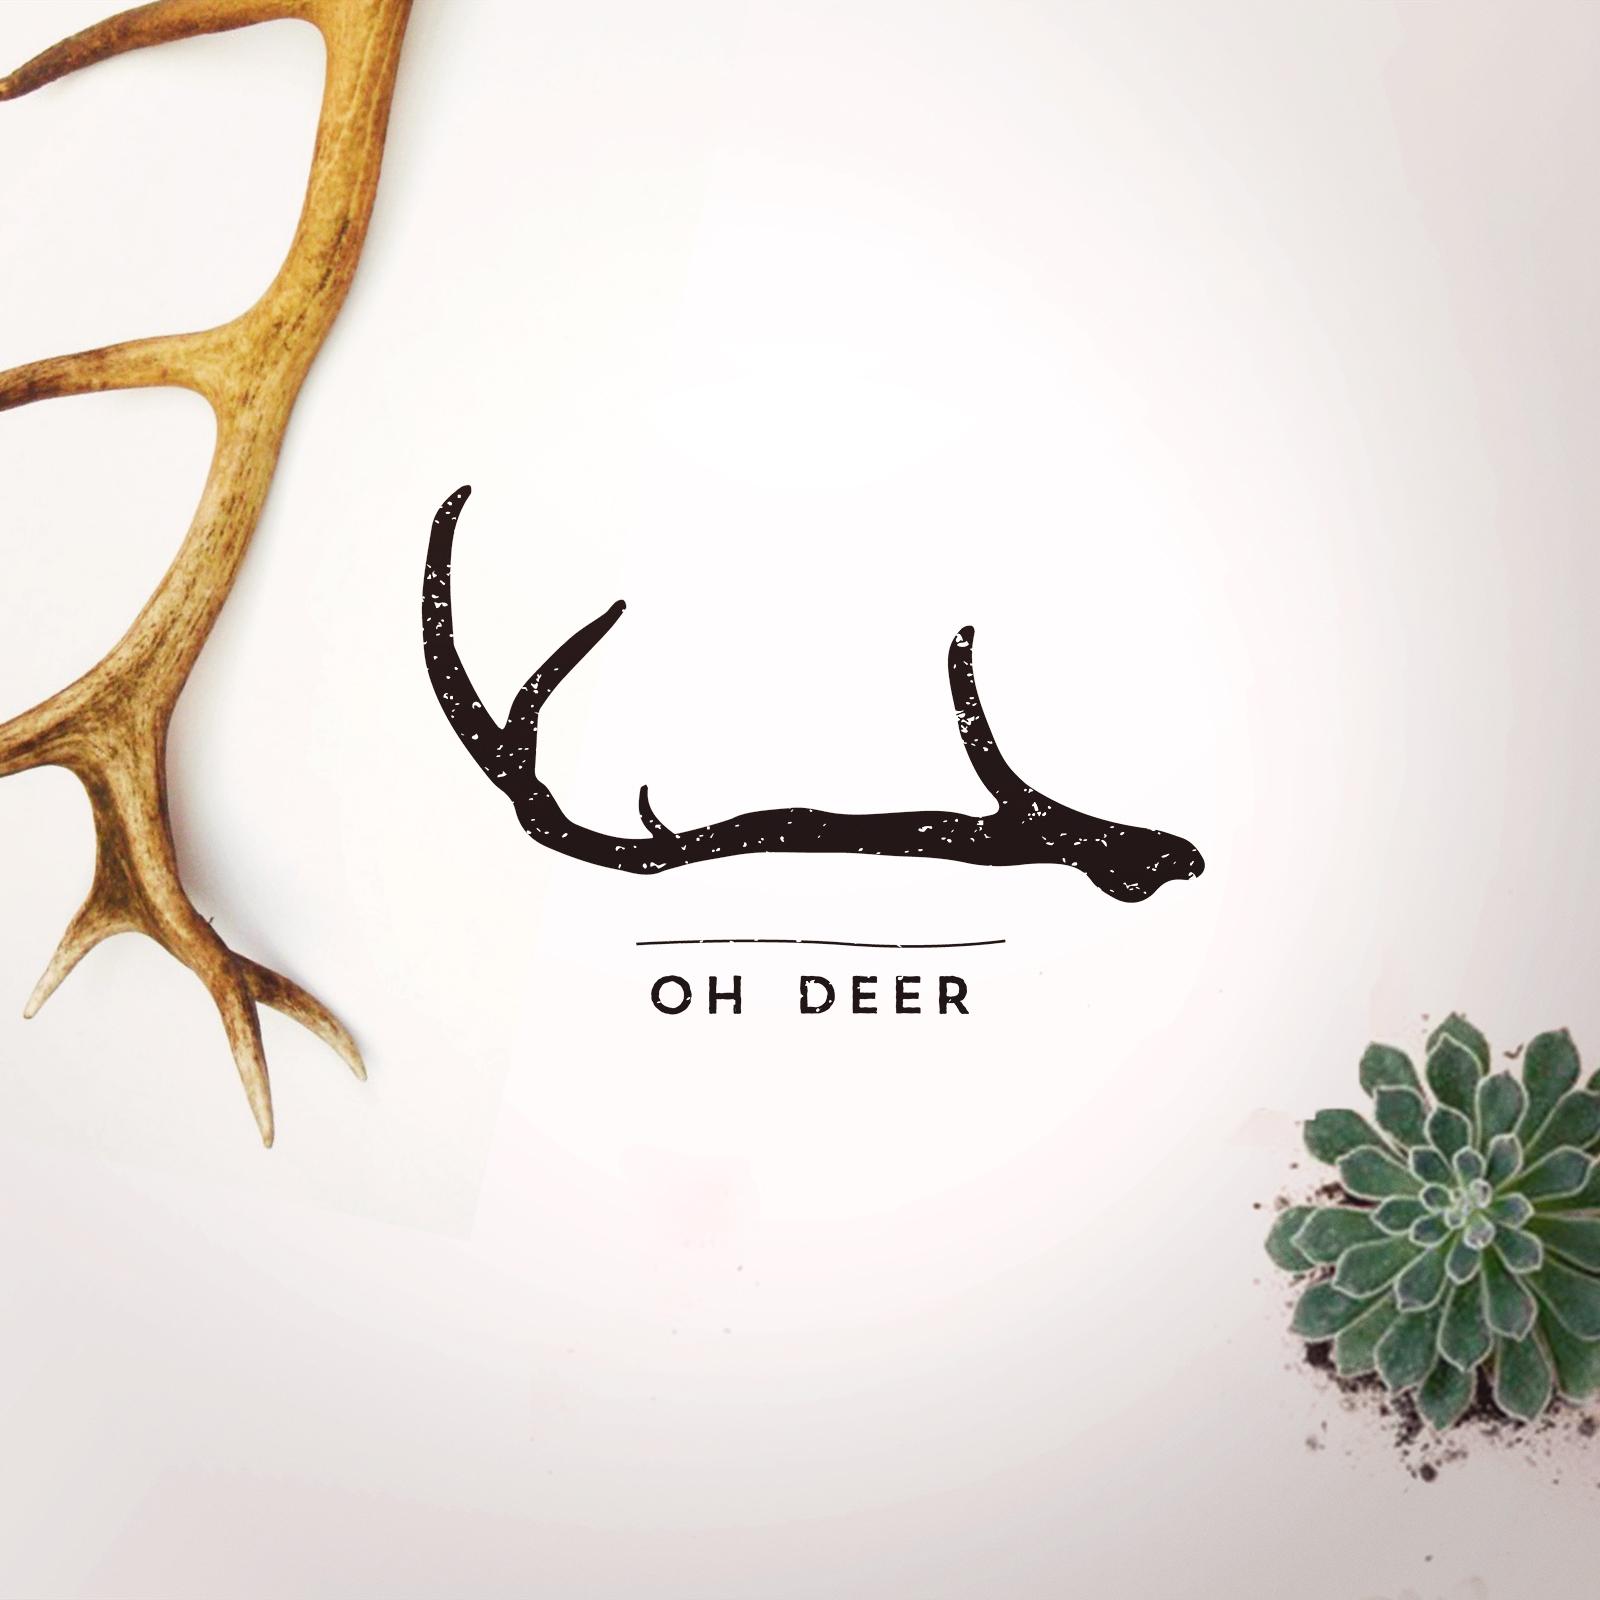 Oh deer logo on white background with black antler above lettering